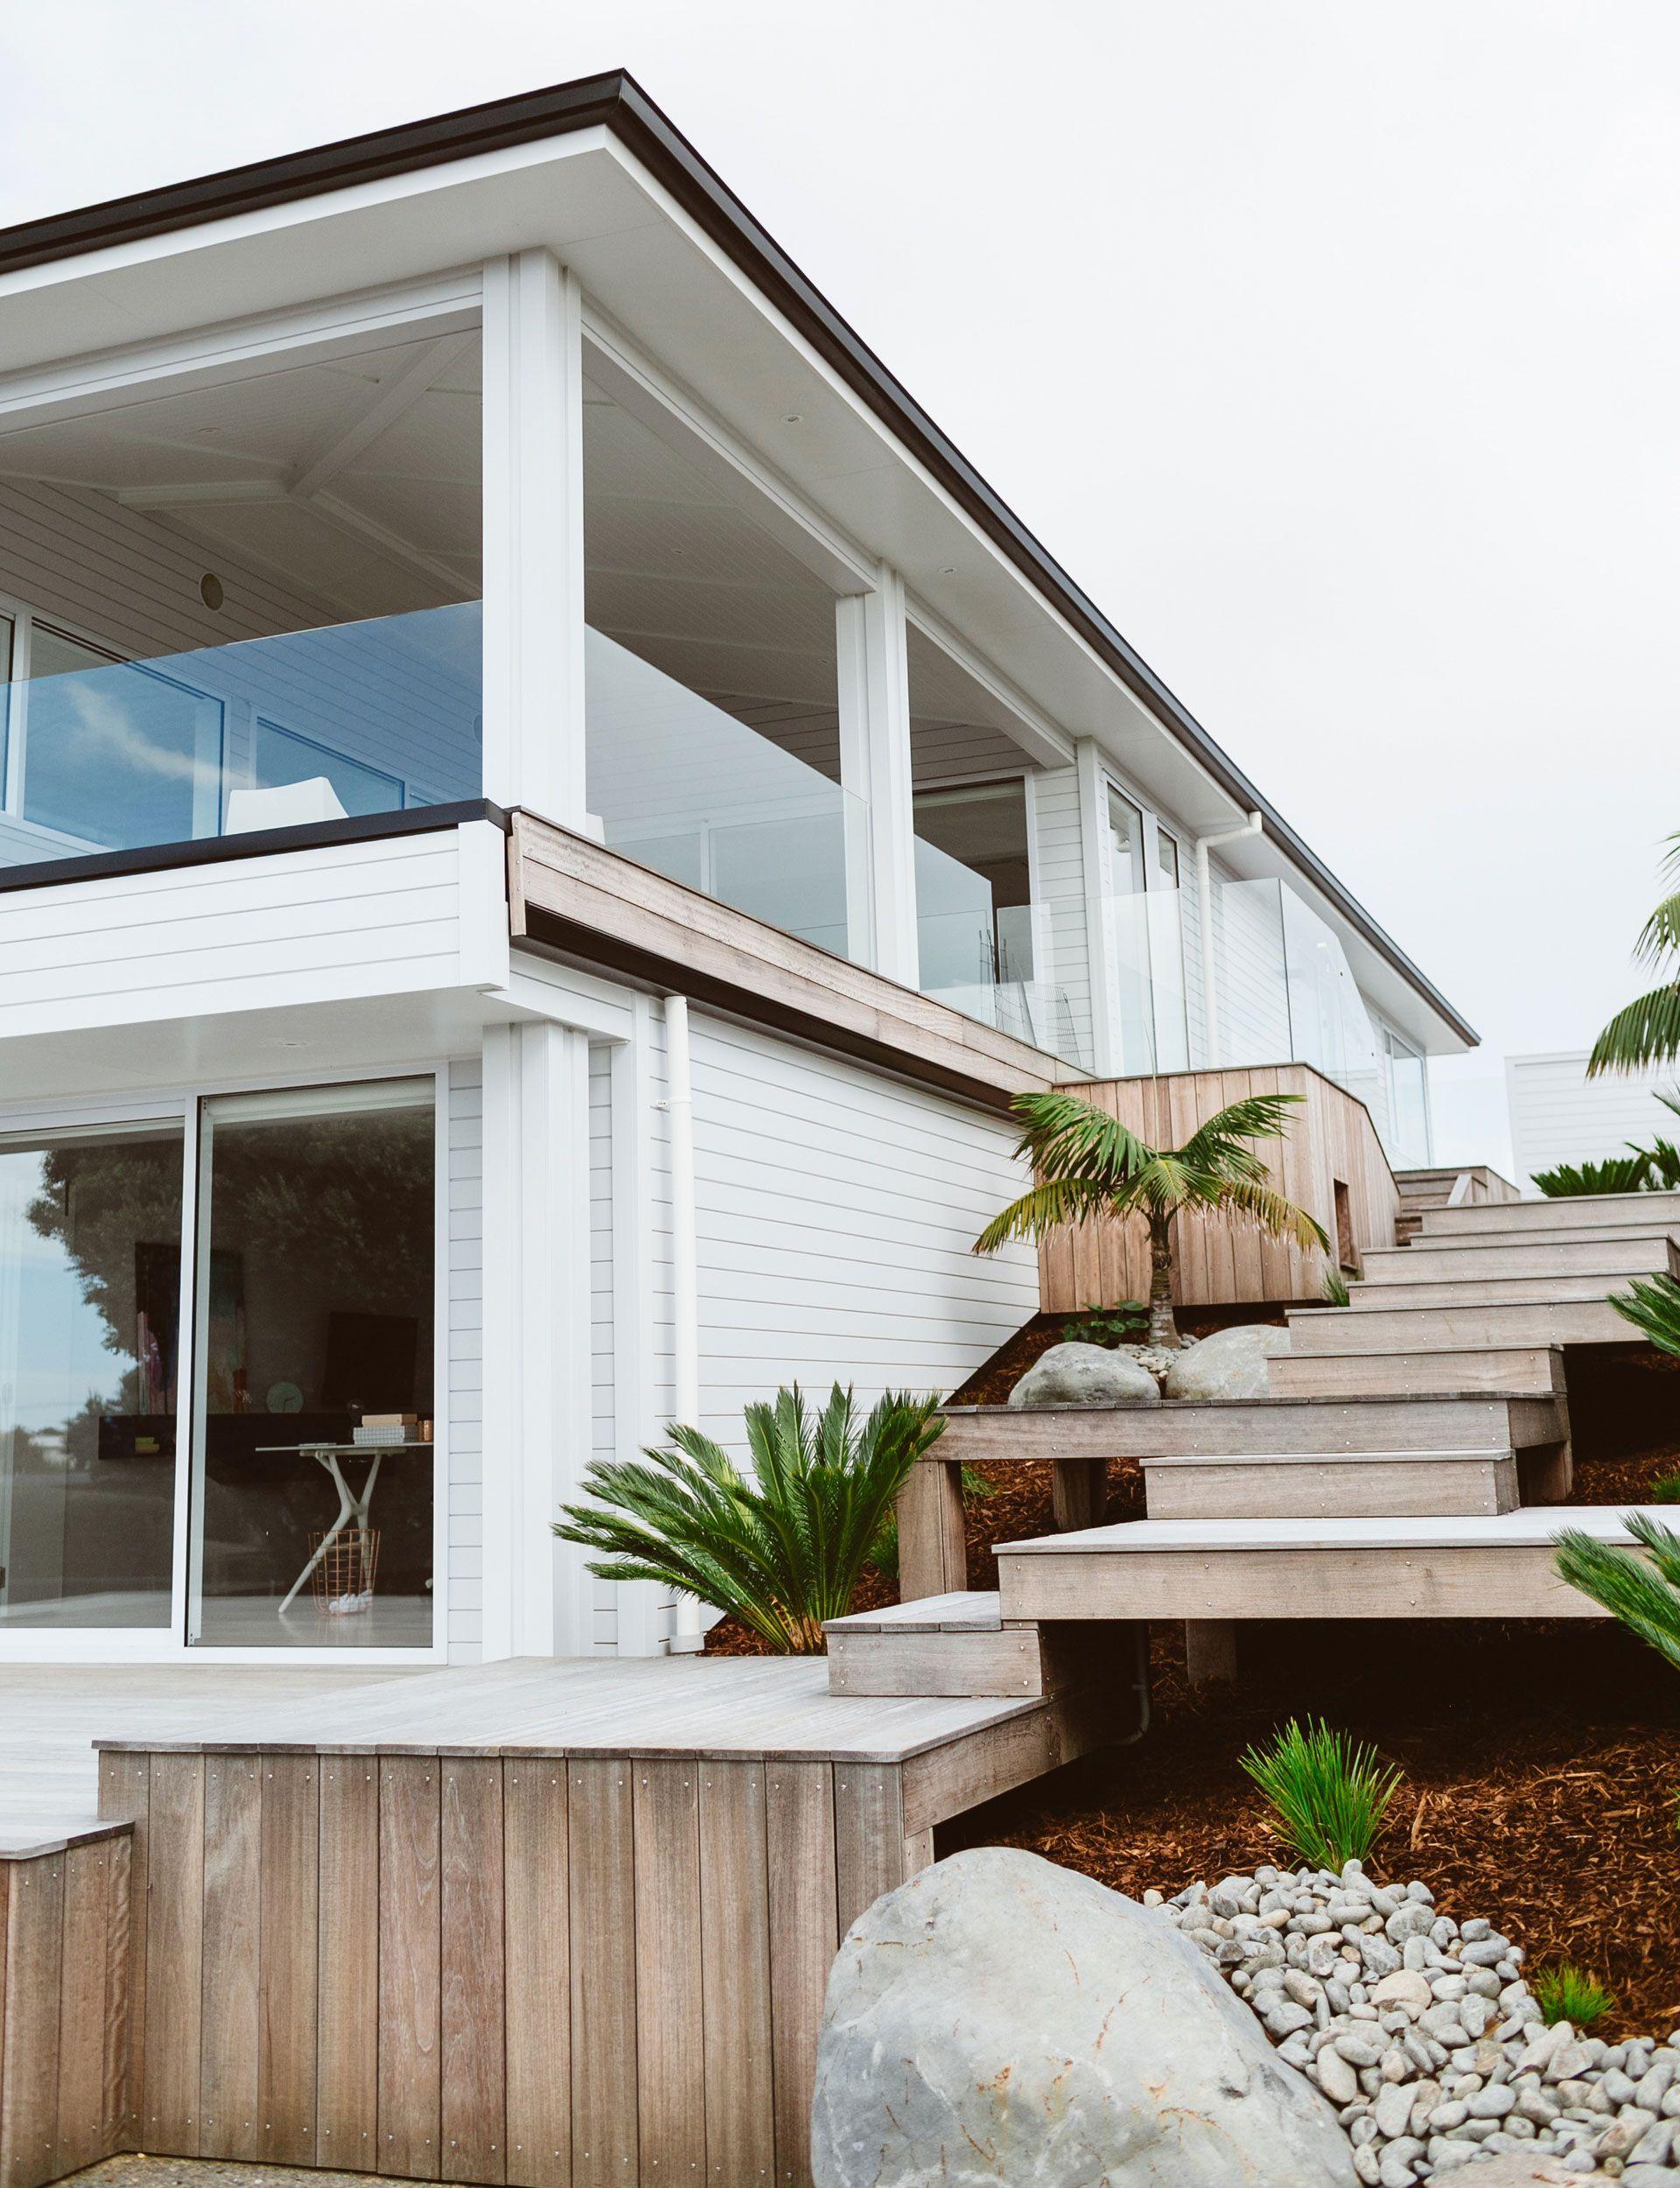 Bestes hausfrontdesign tauranga family chooses doup over beachfront home  design